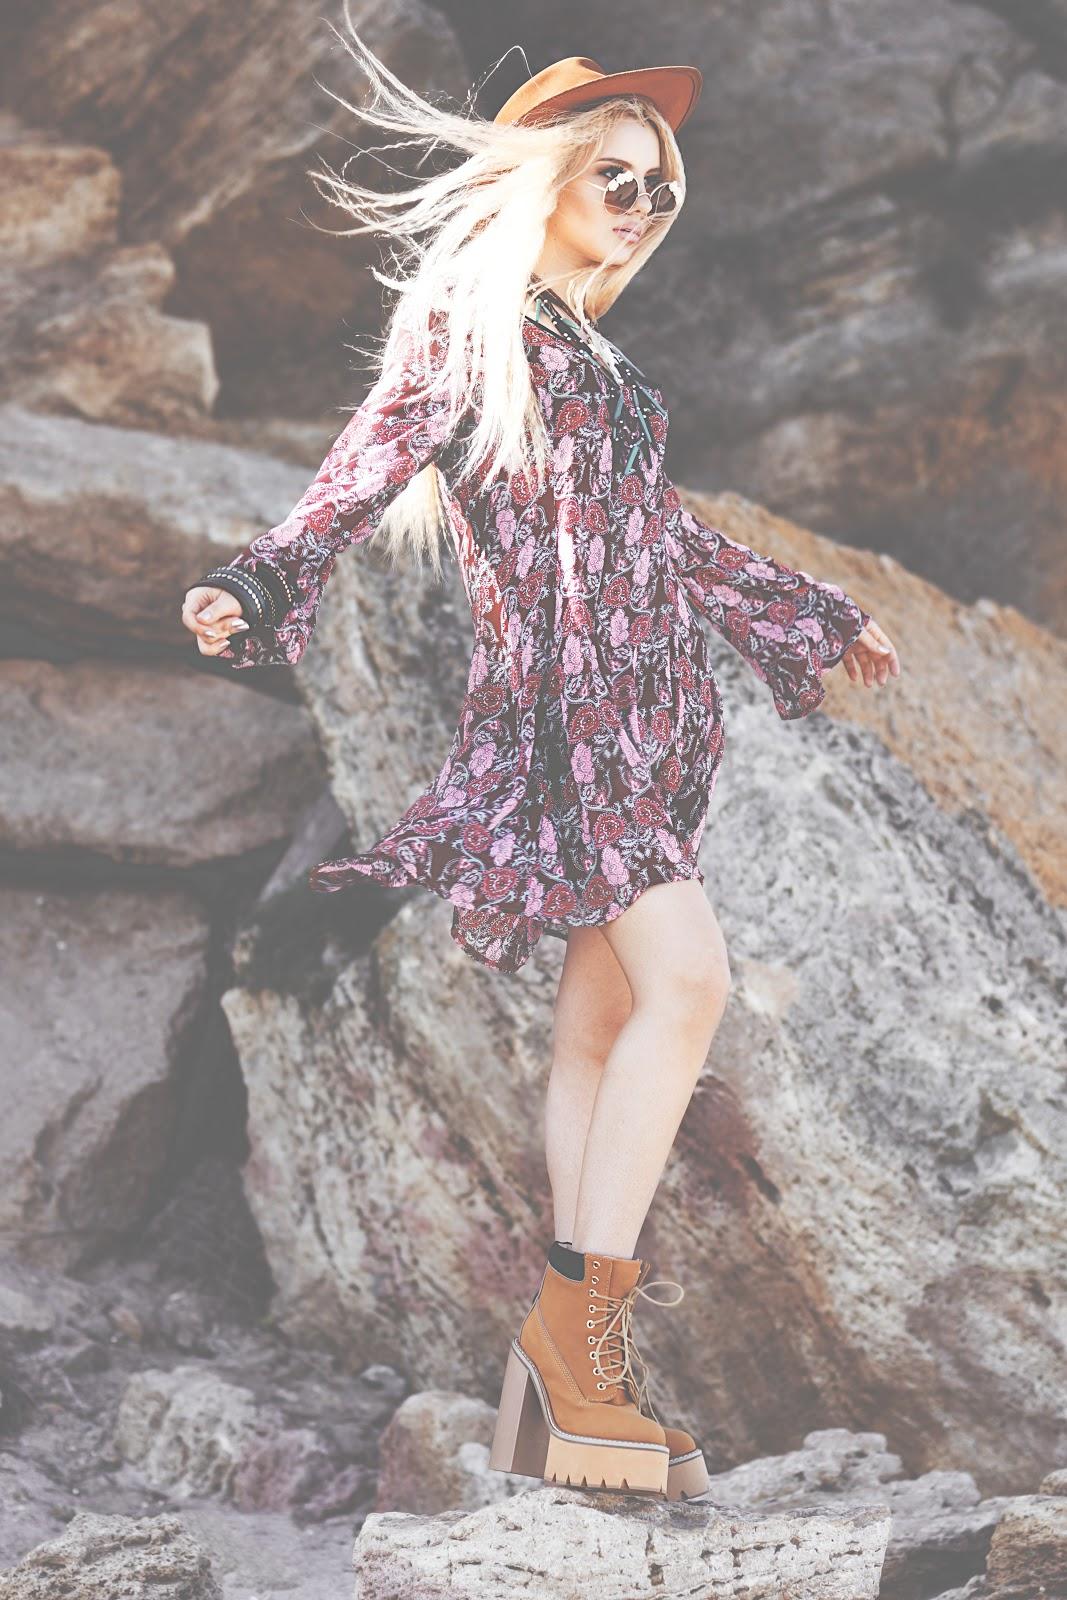 indie boho blogger, boho blogger, fashion blog, coachella look, look for music festival